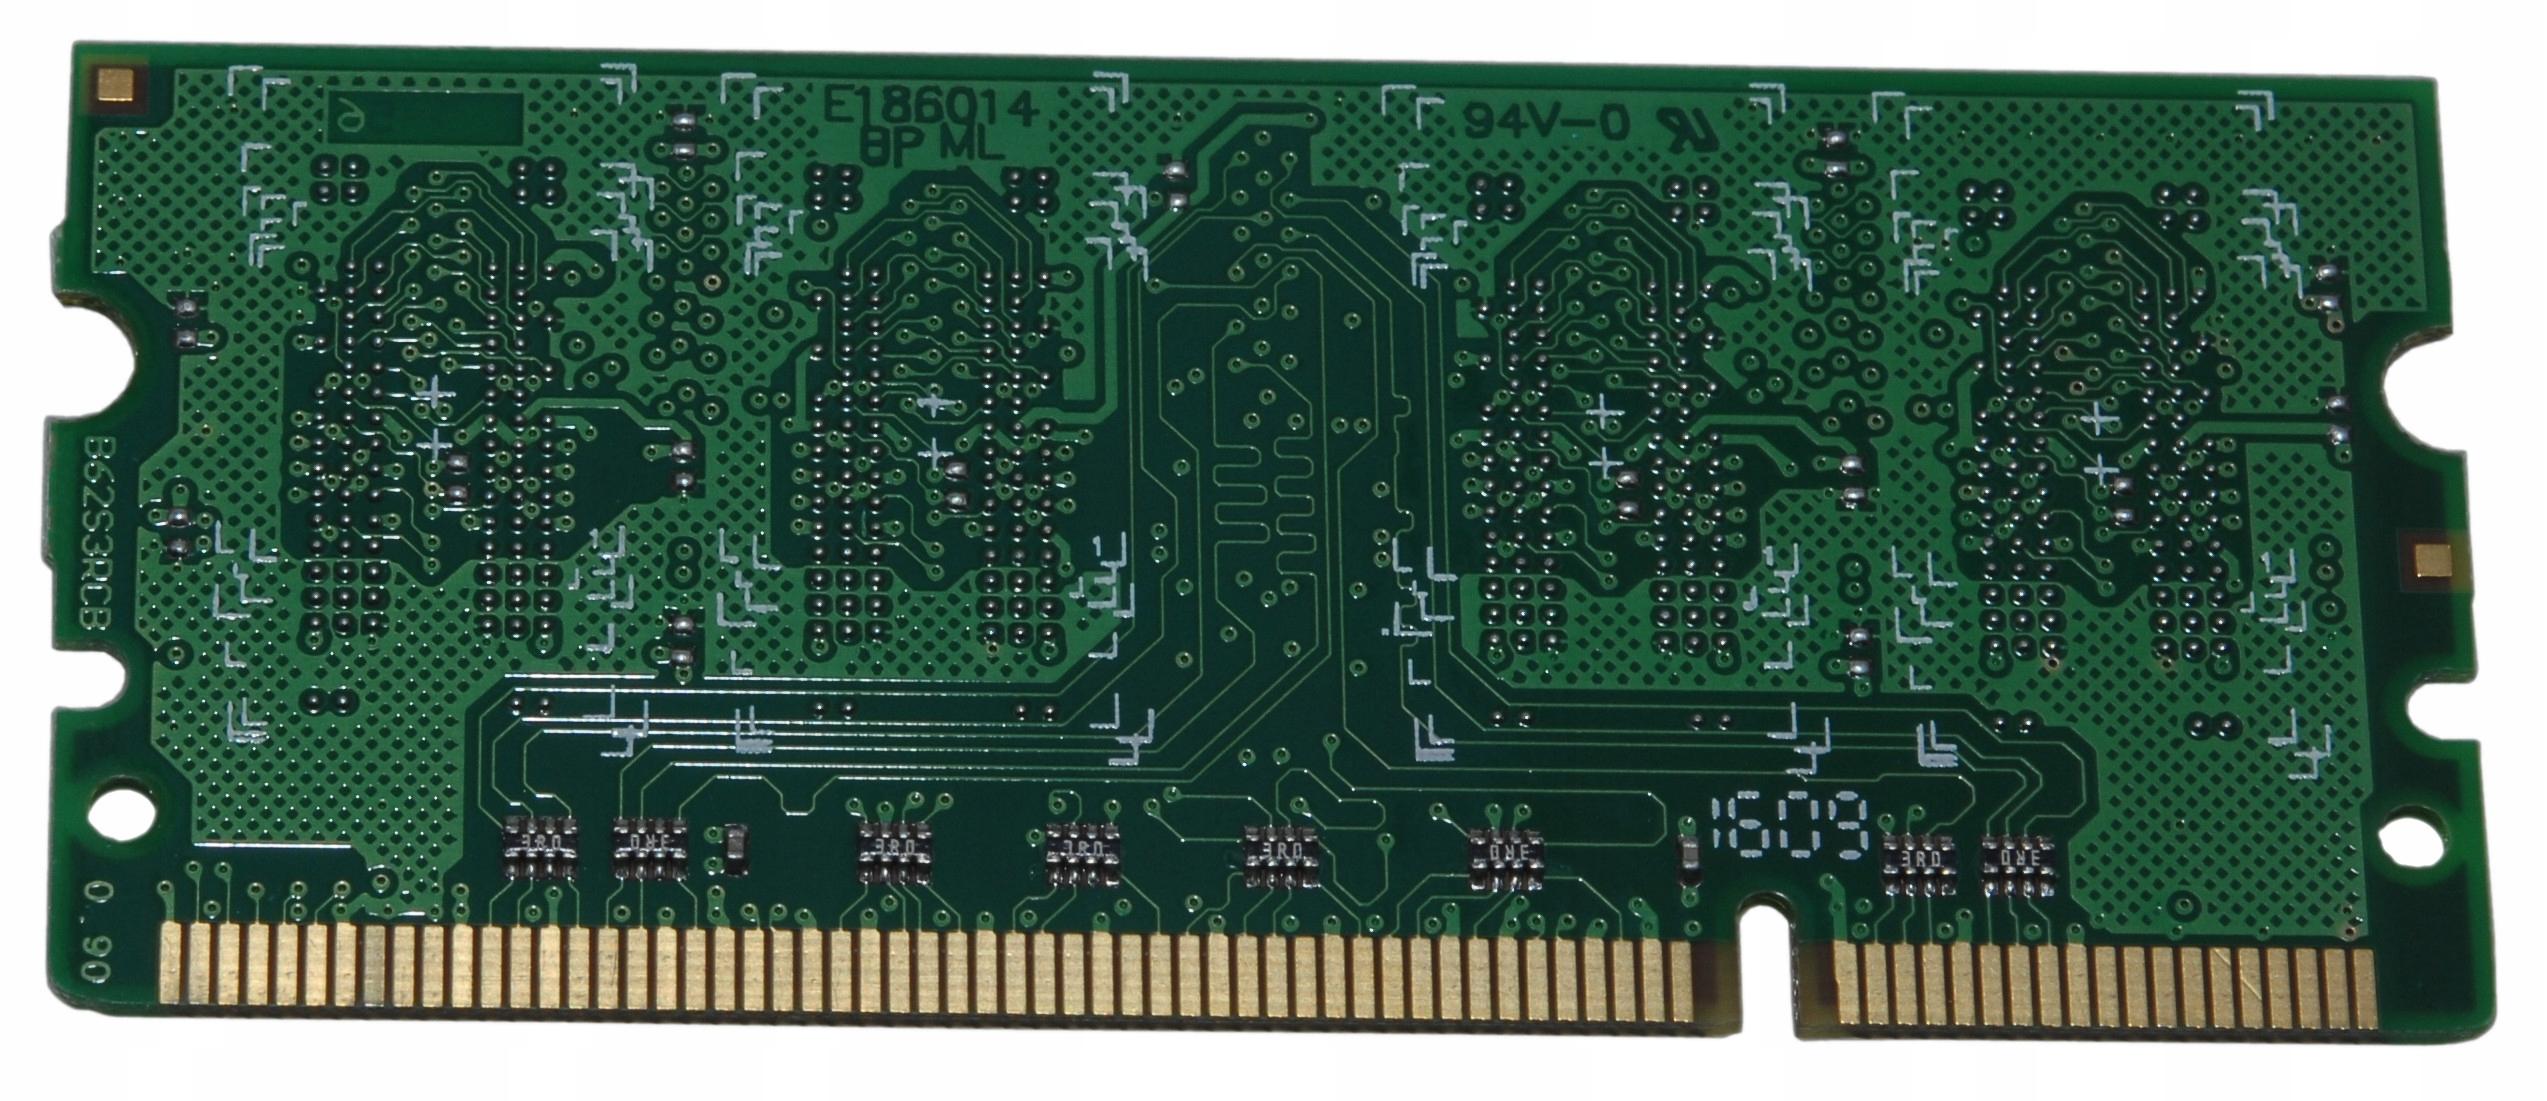 RAM RAM483A 512MB 144PIN HP LASERJET P4015